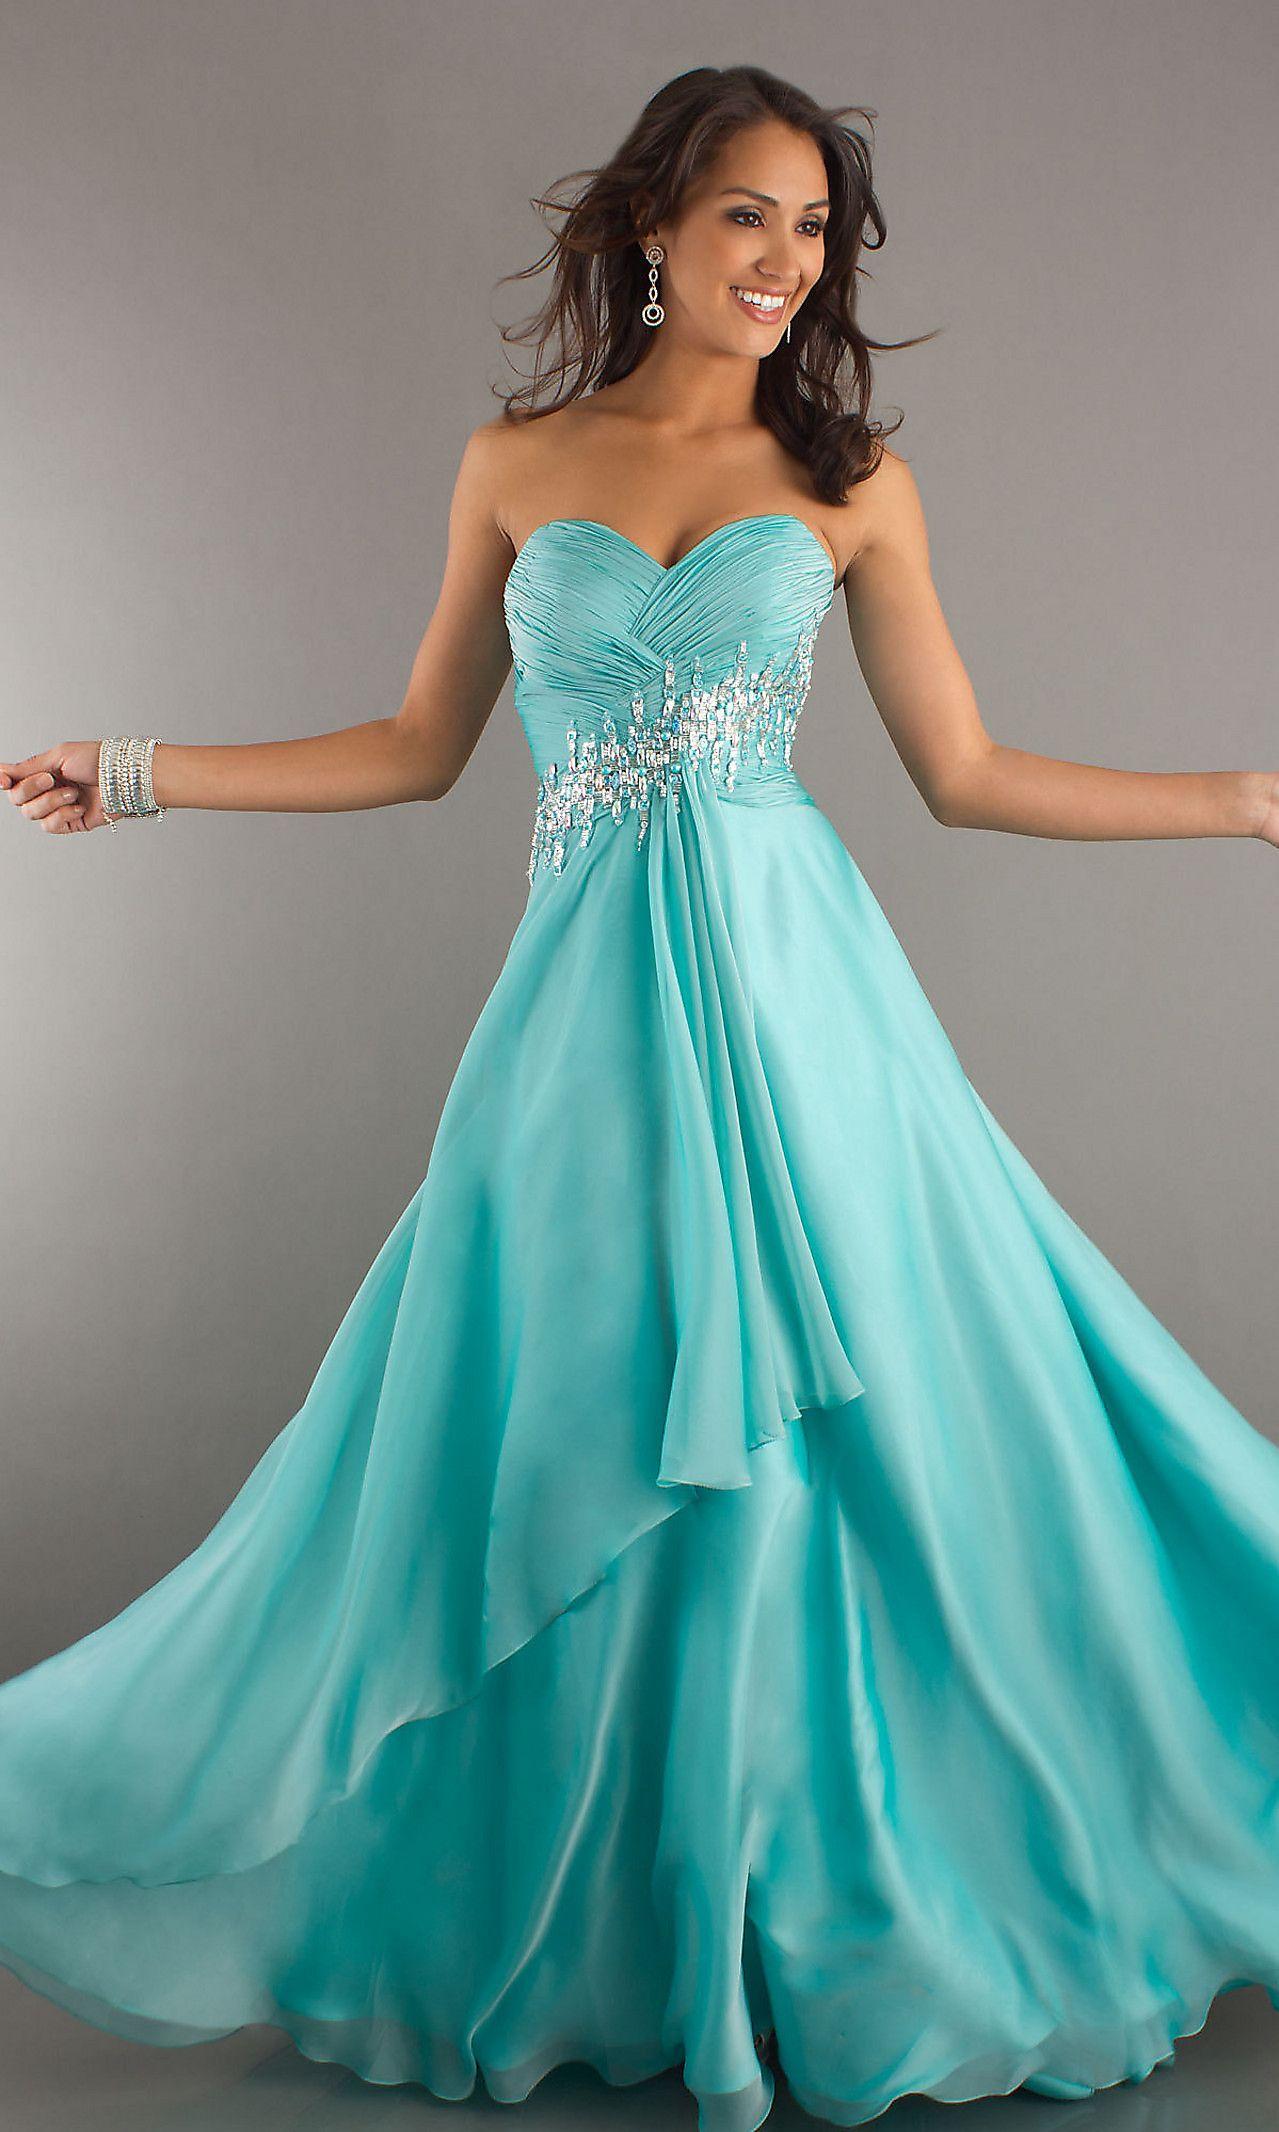 Best Crush Prom Dresses Ideas - Wedding Ideas - memiocall.com